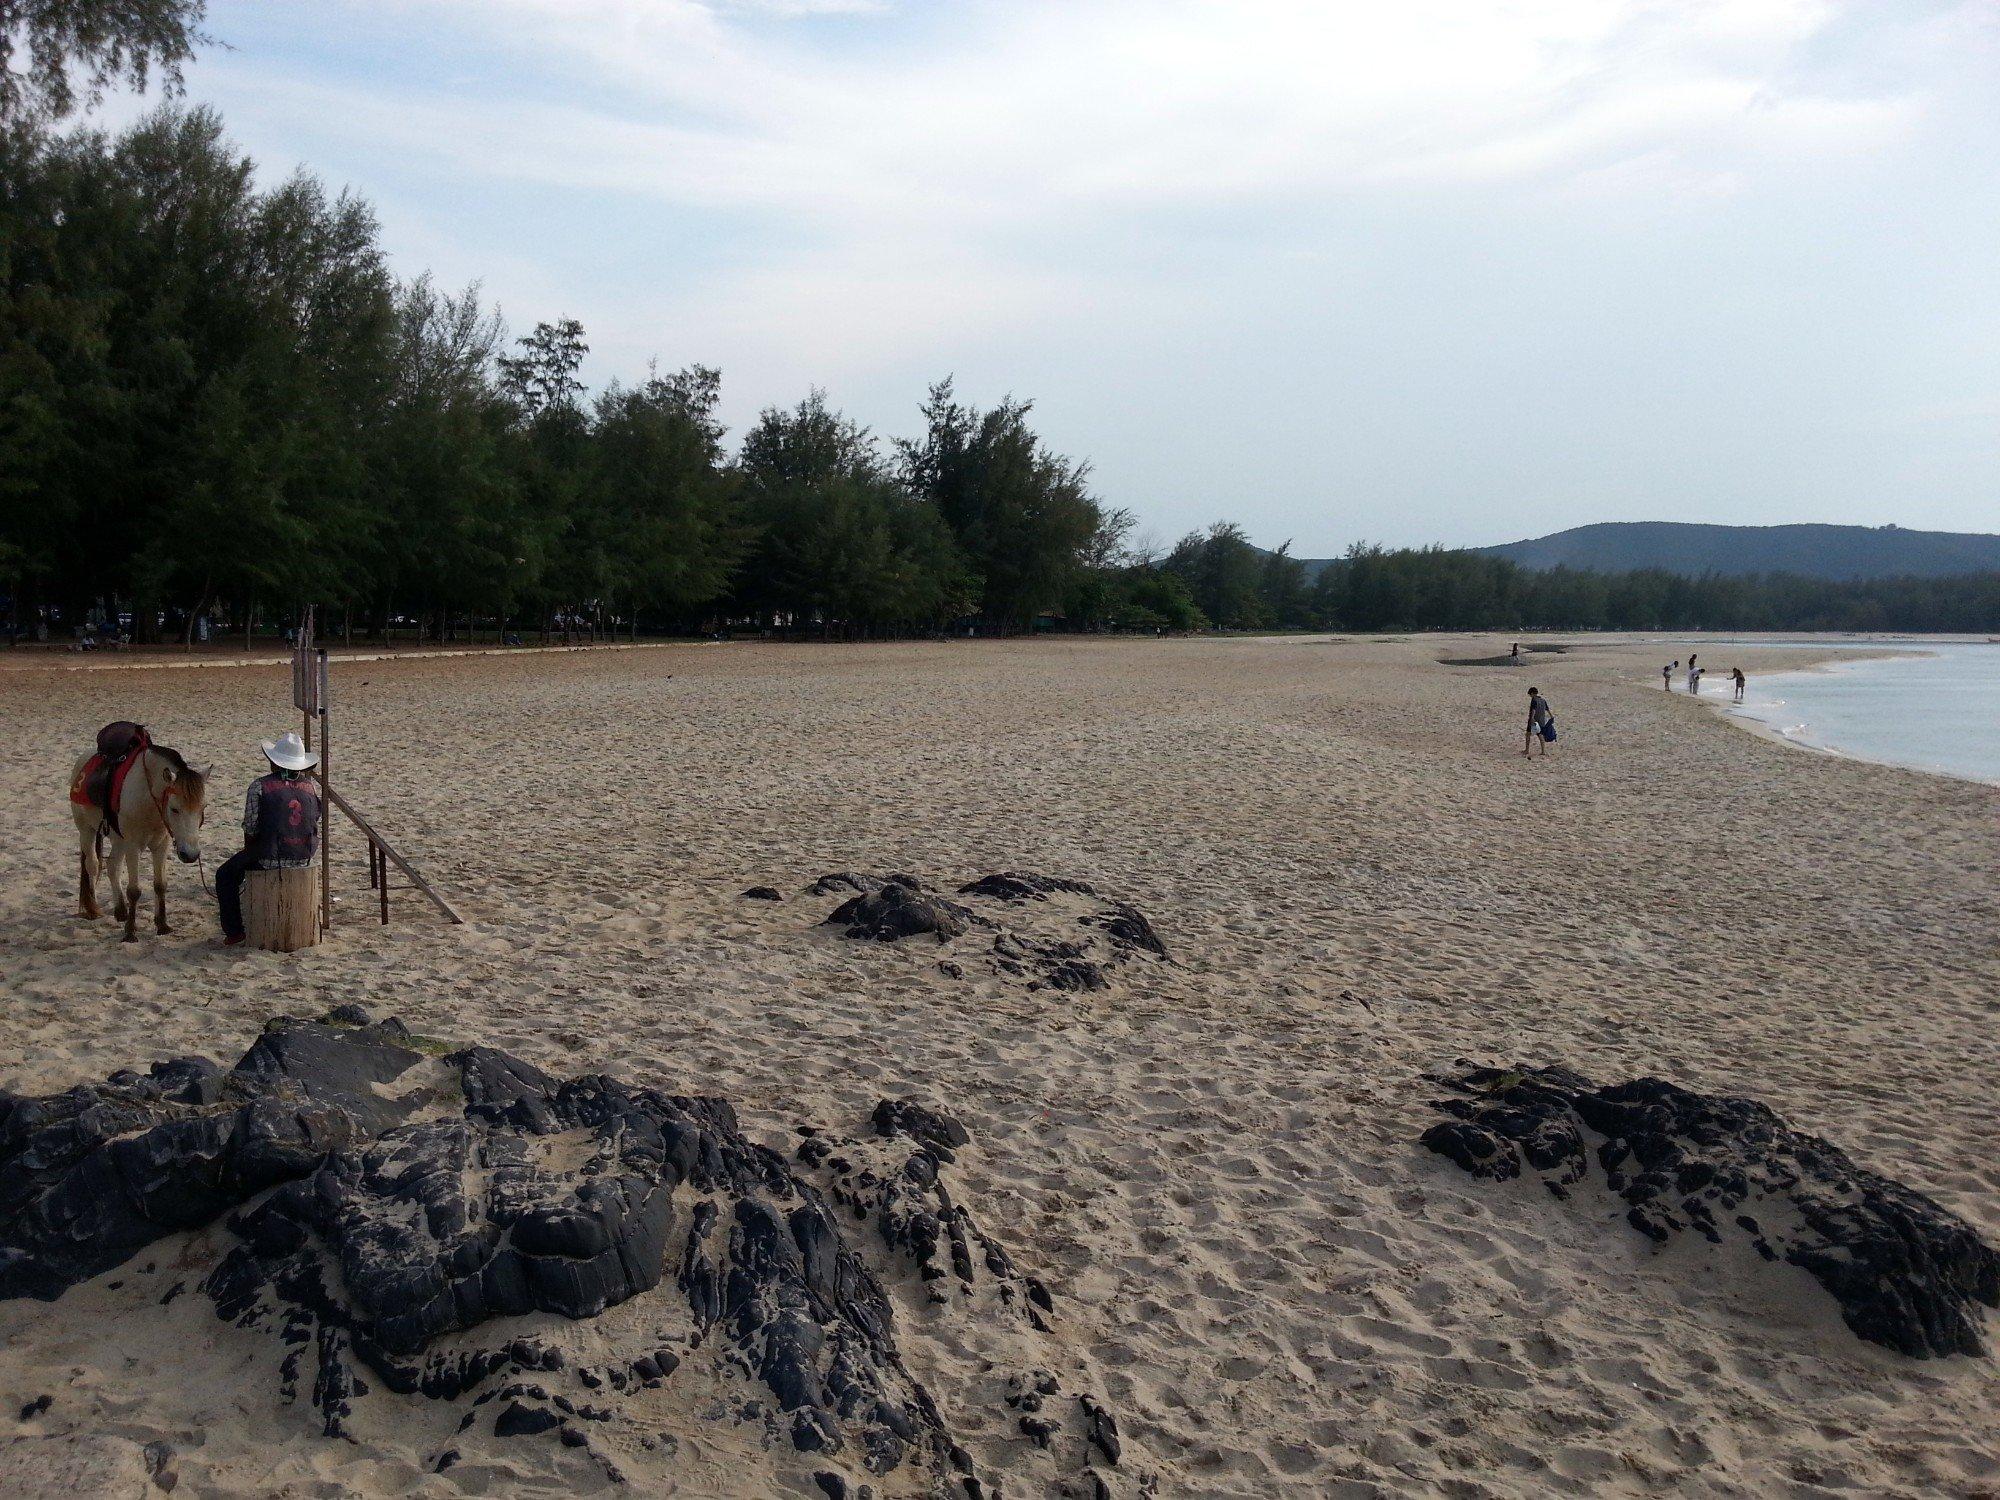 Looking west on Samila Beach